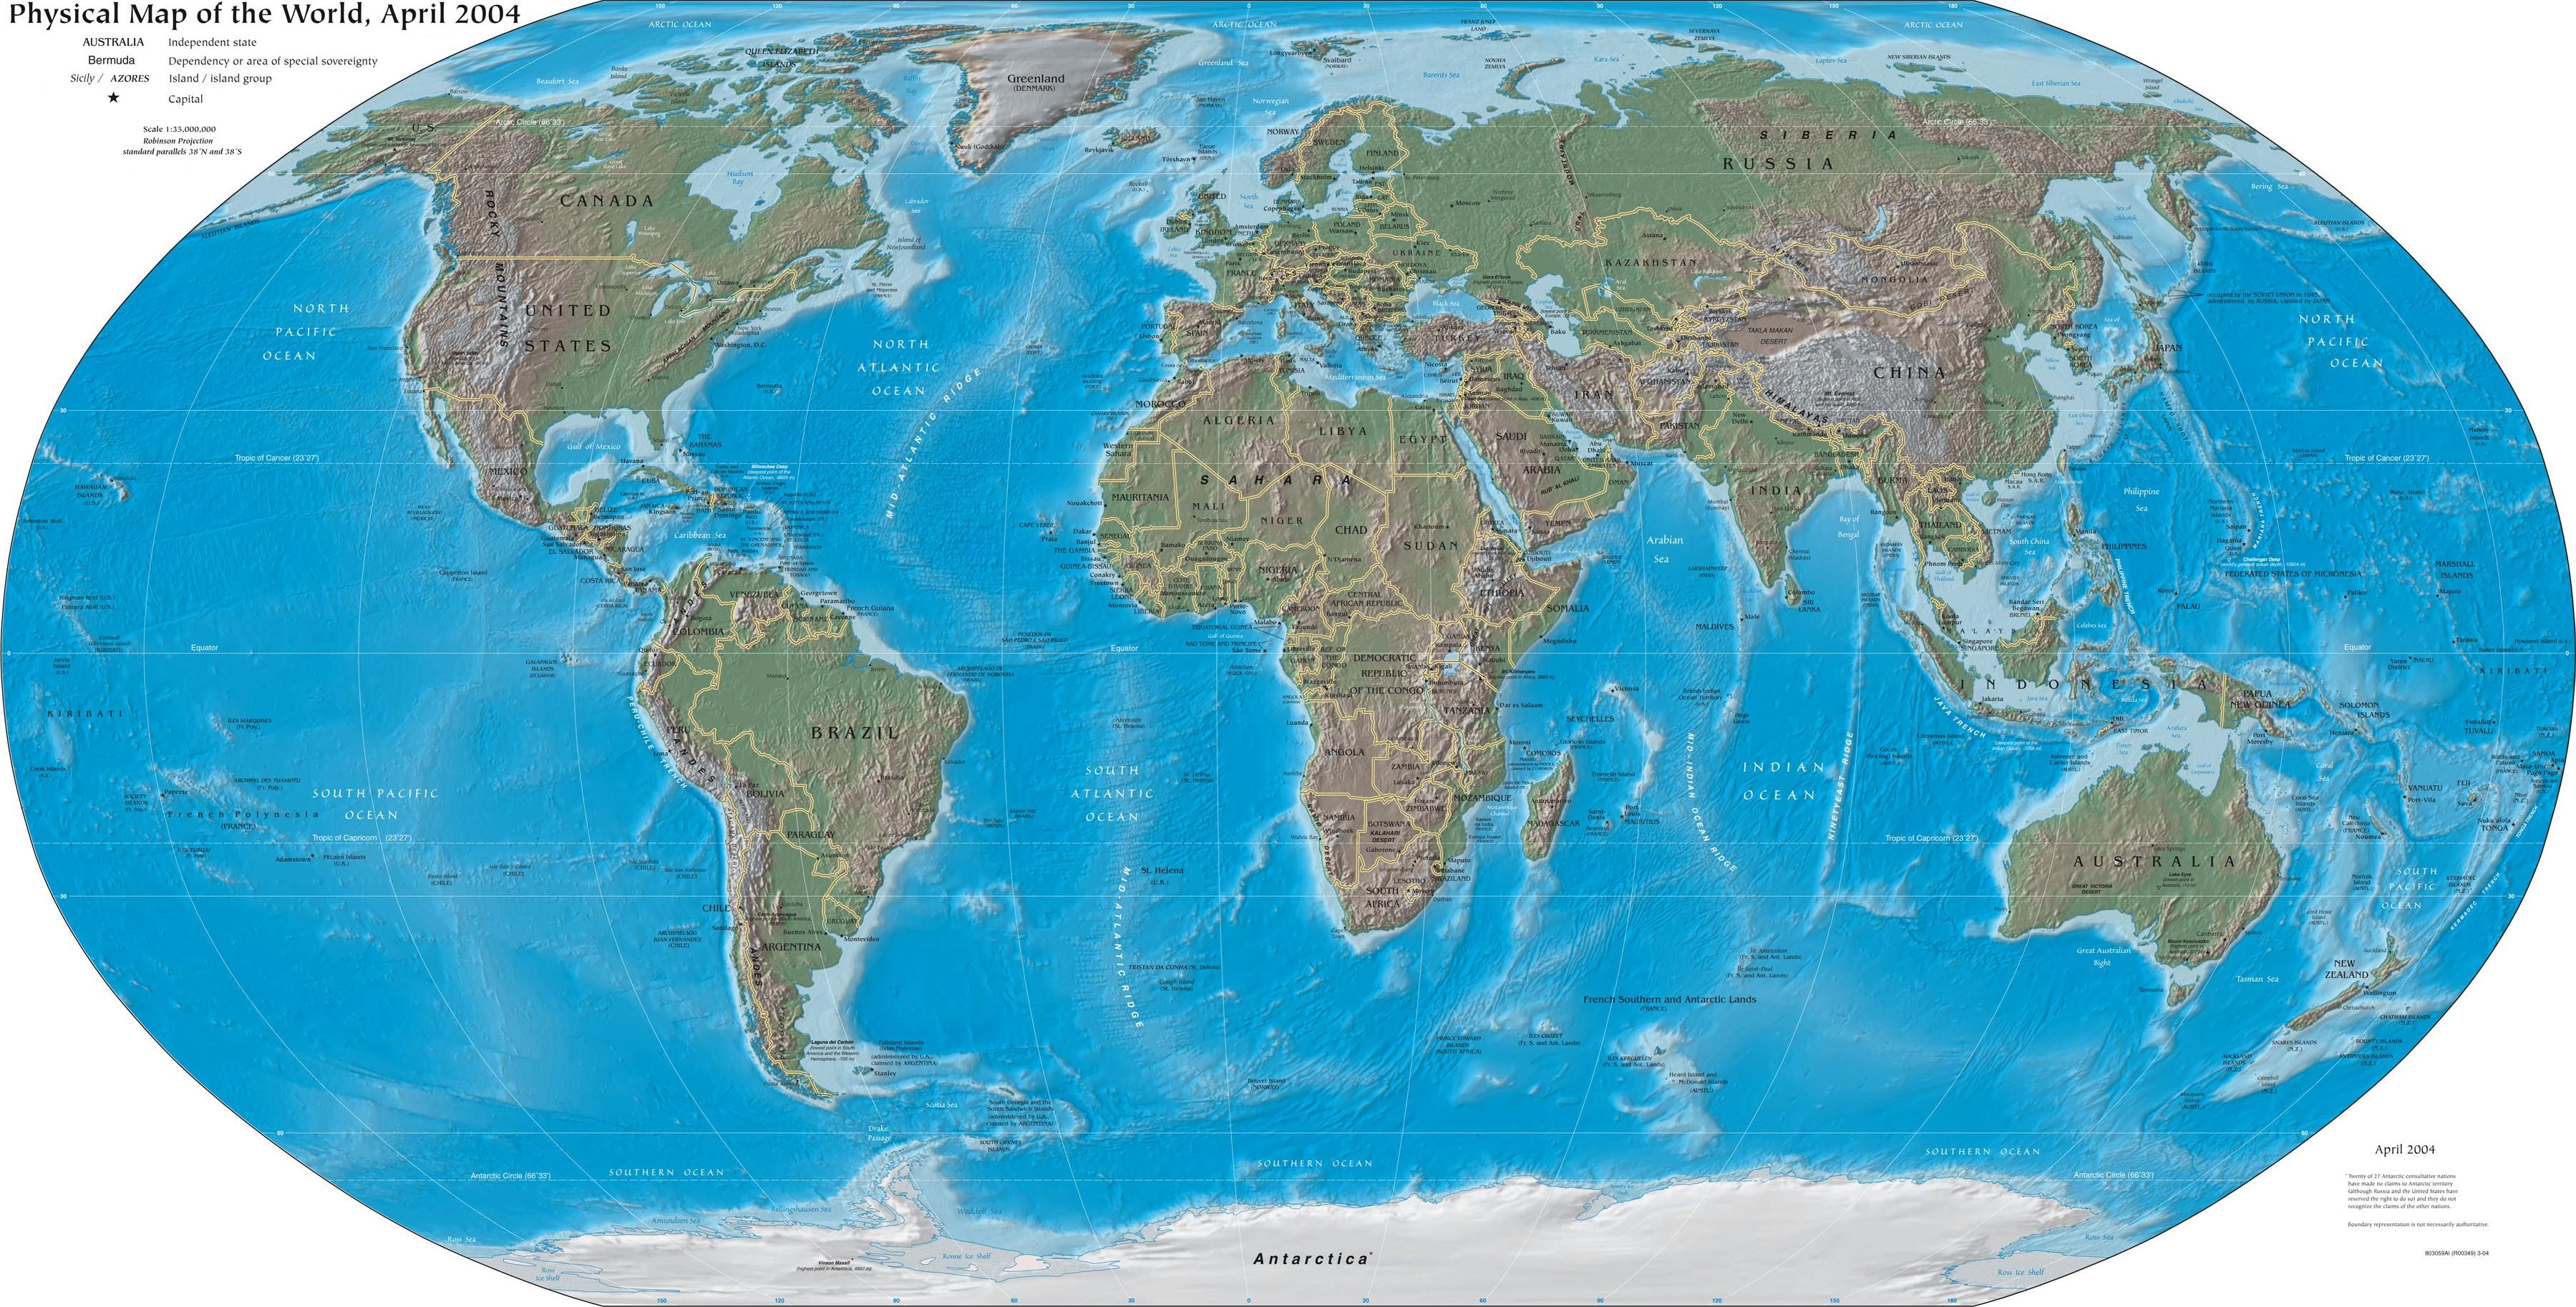 Geography Maps | Evolutionside